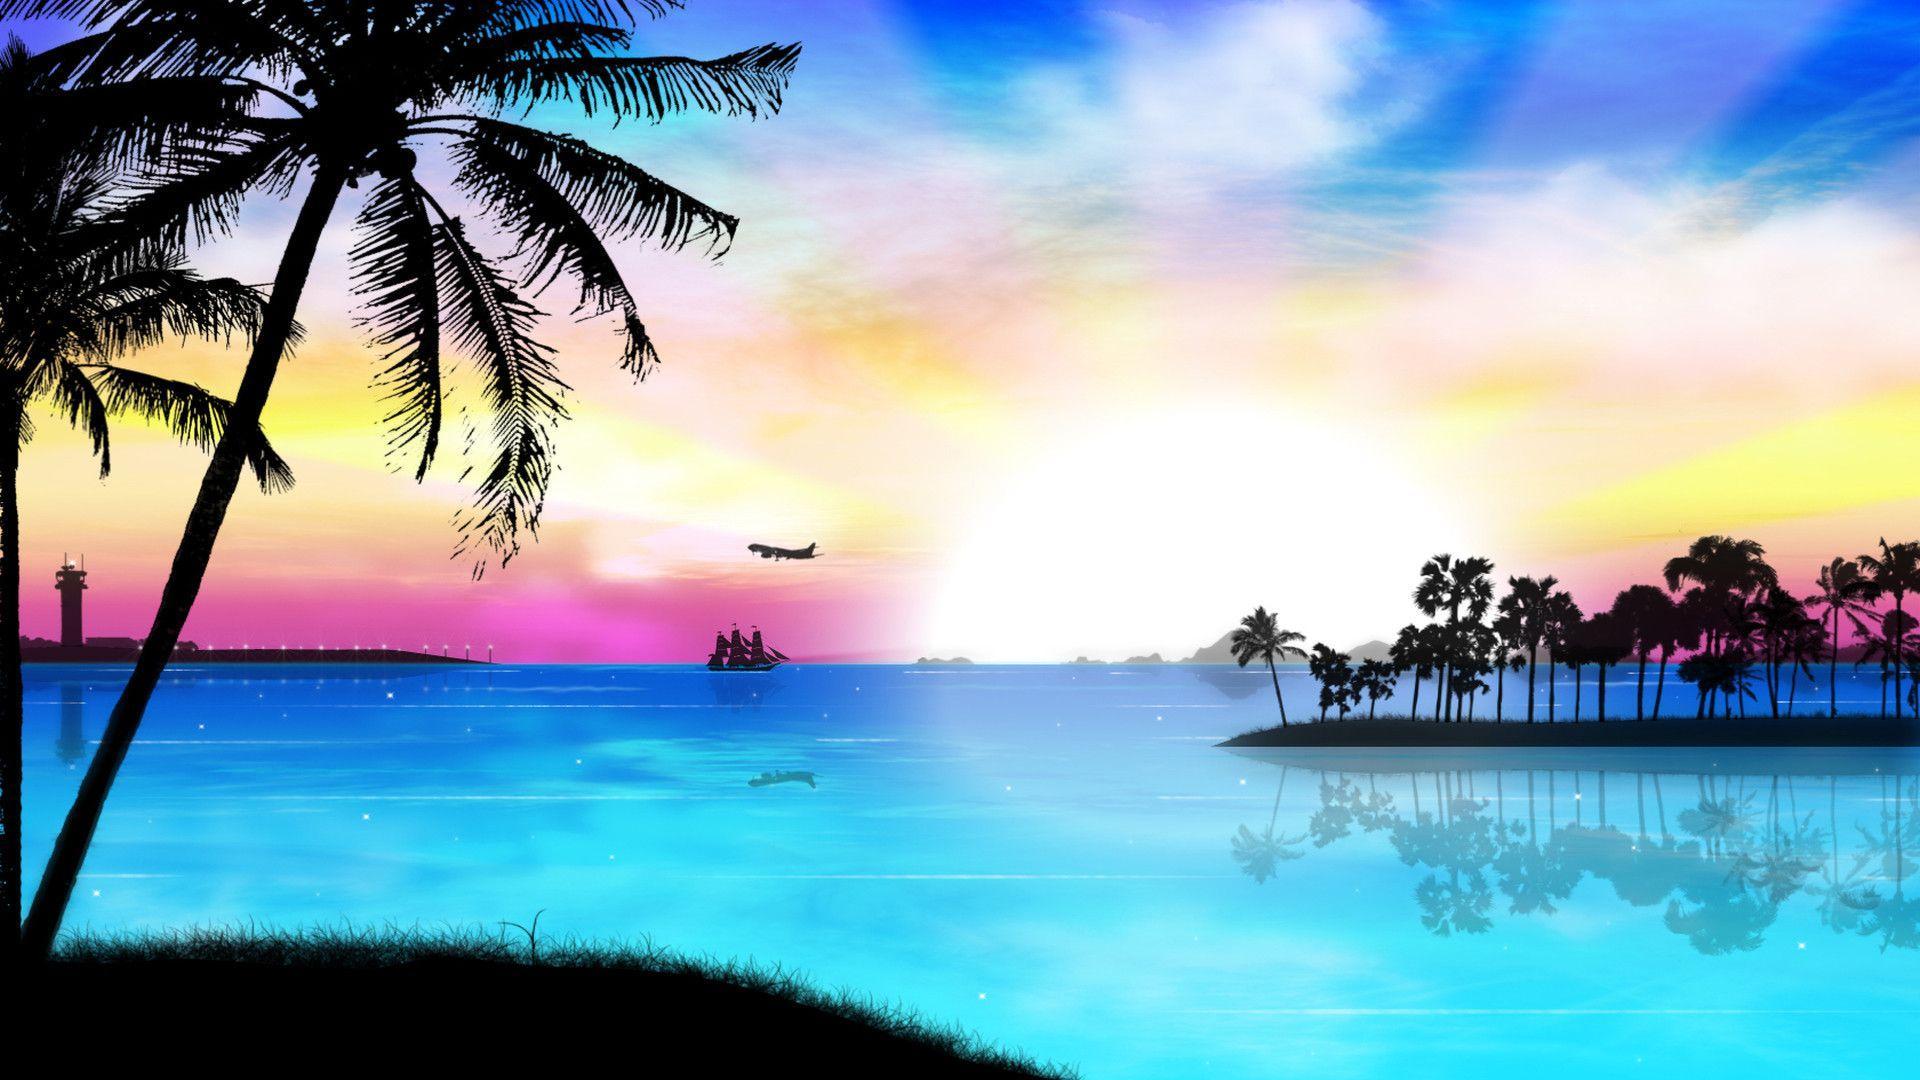 1920x1080 HD Tropical Island Beach Paradise Wallpaper And Background - Tropical Beach Sunset Background - 1680x1050 - Tải xuống Hình nền HD